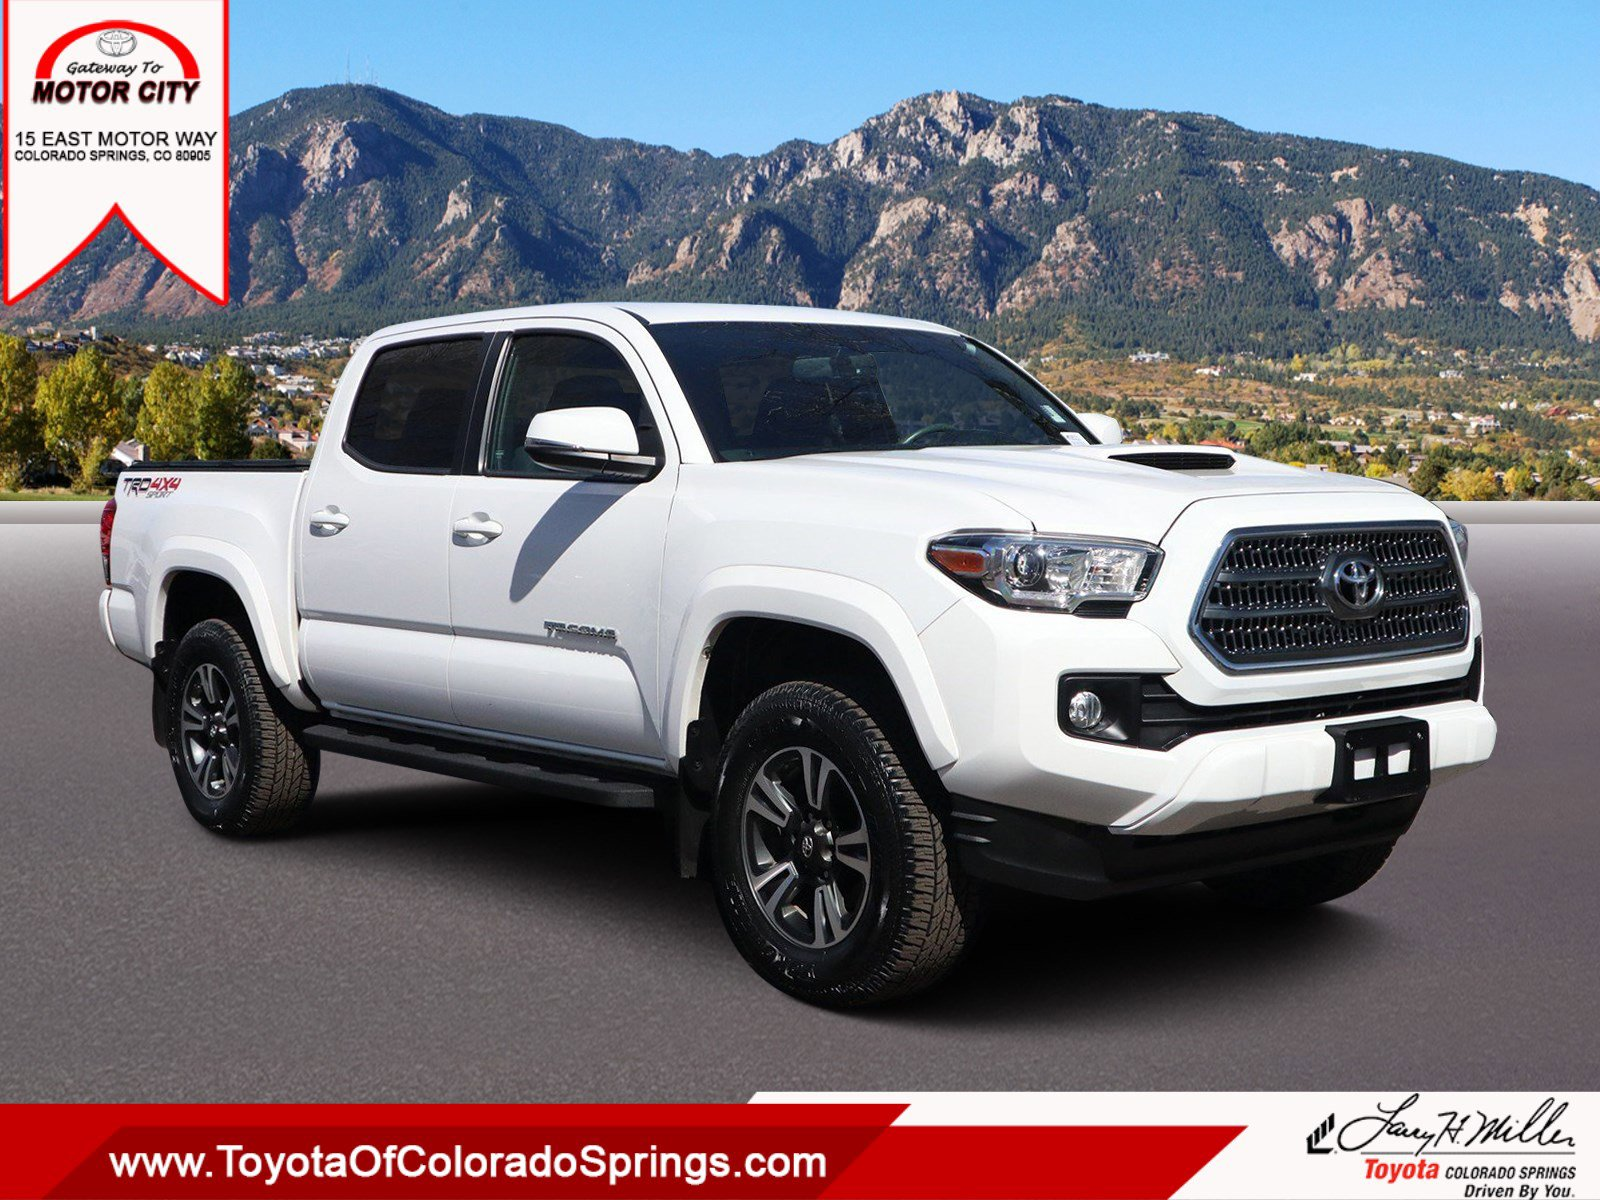 2017 Toyota Tacoma TRD Sport image